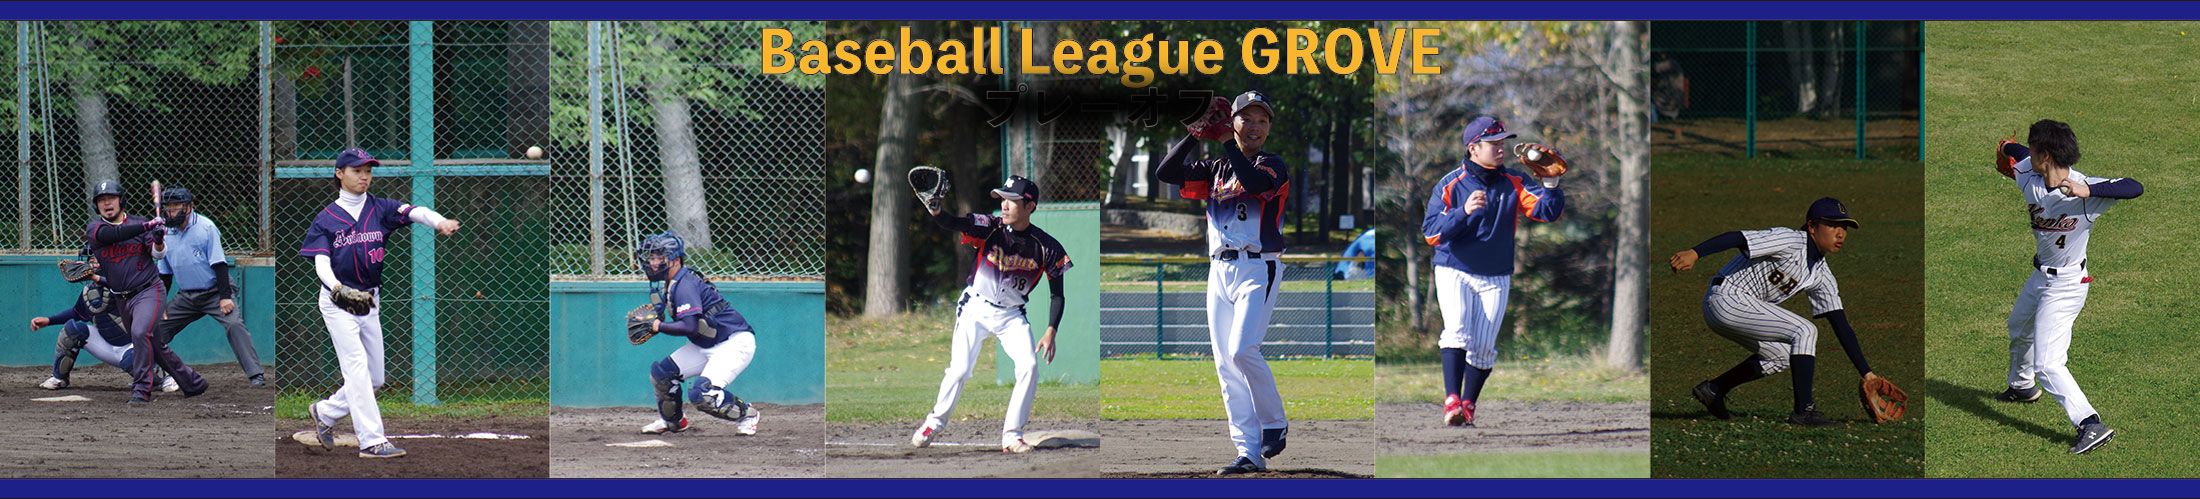 Baseball League GROVE